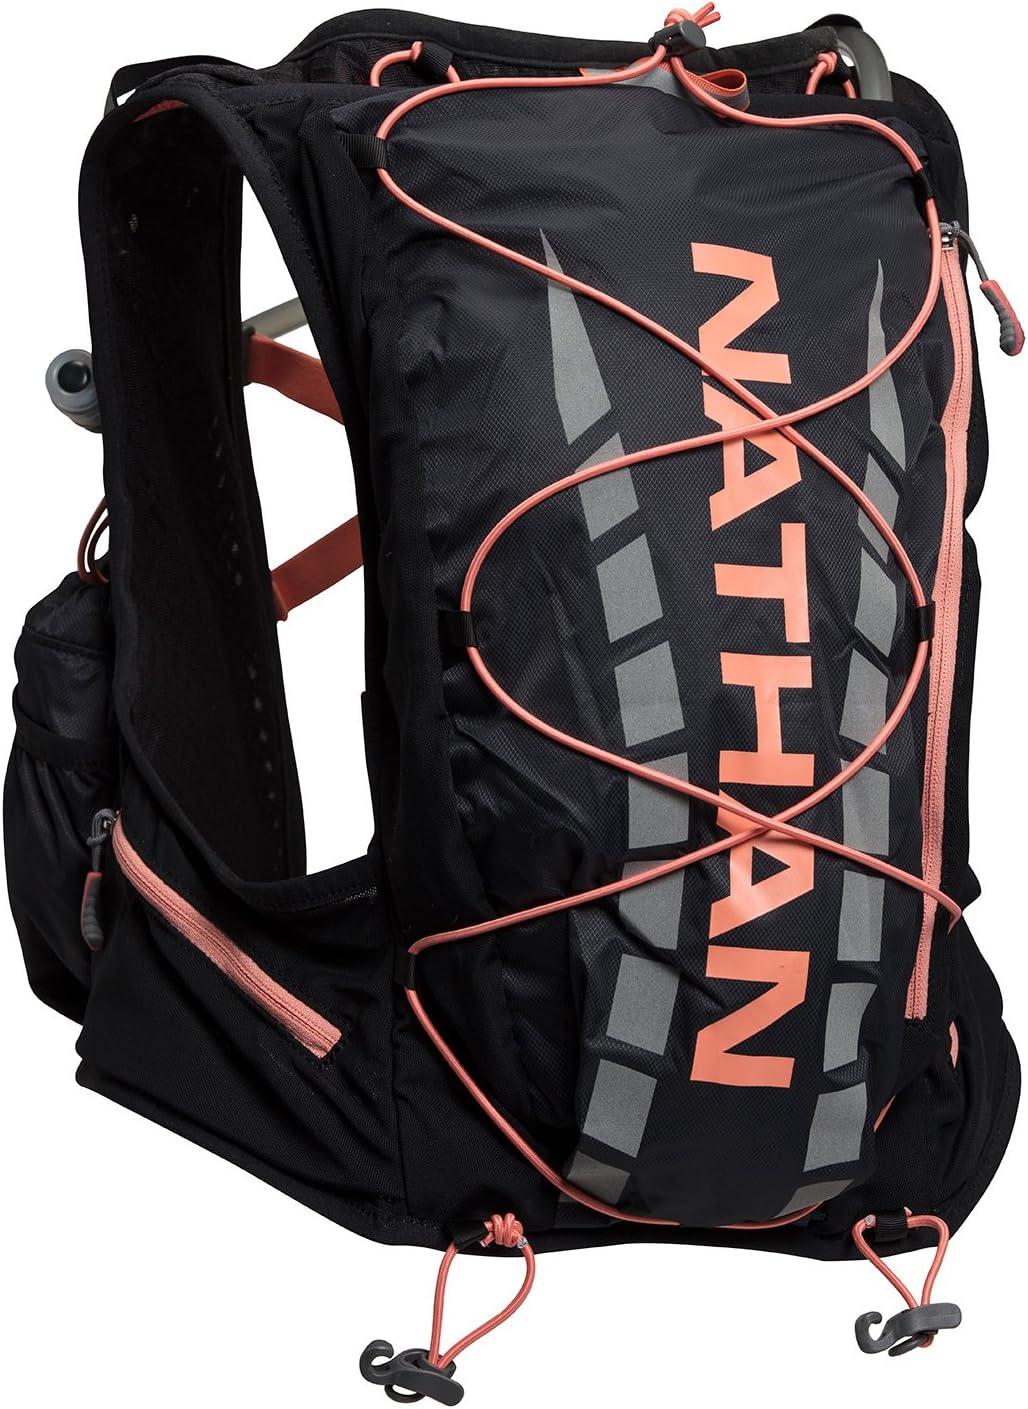 Nathan NS4527 Vaporairess Trinkrucksack Laufweste mit 2 l Blase XX-Small NS4527 Damen Black//Fusion Coral